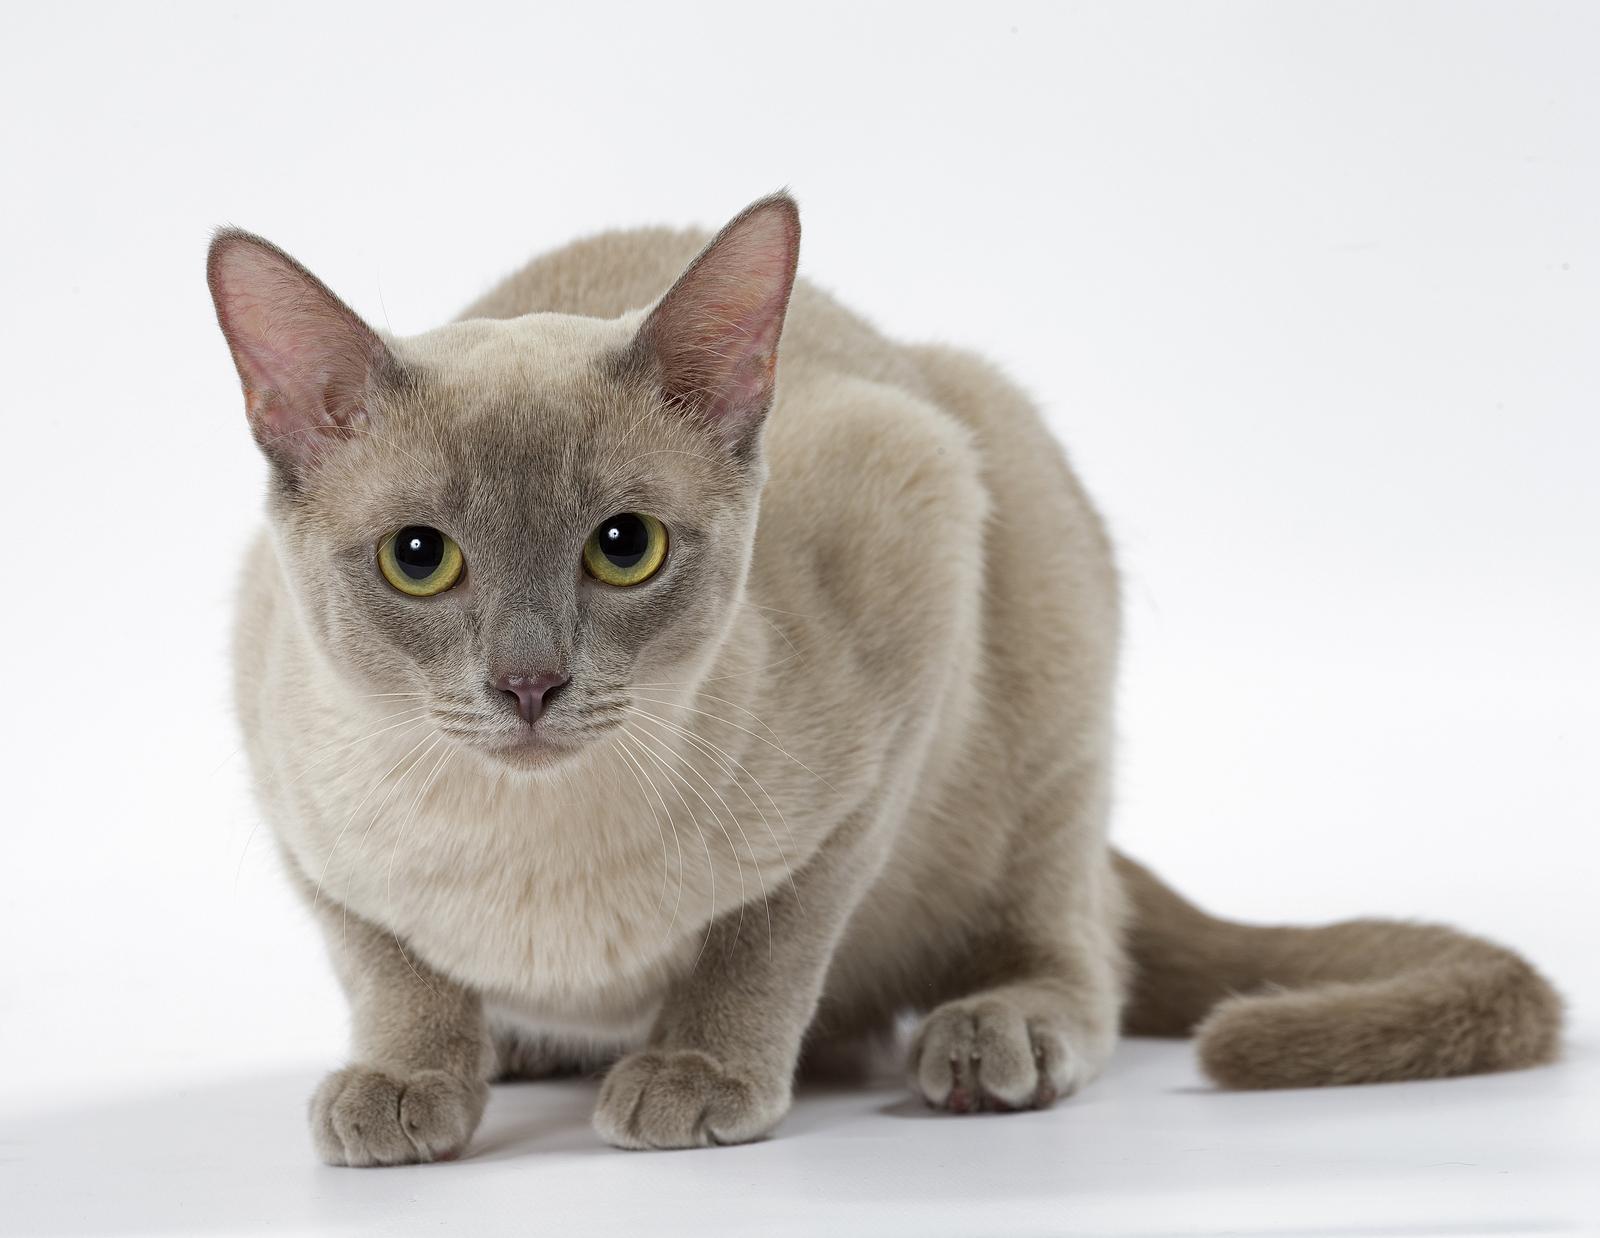 50 Jenis Kucing Di Dunia Beserta Sejarah Lengkap